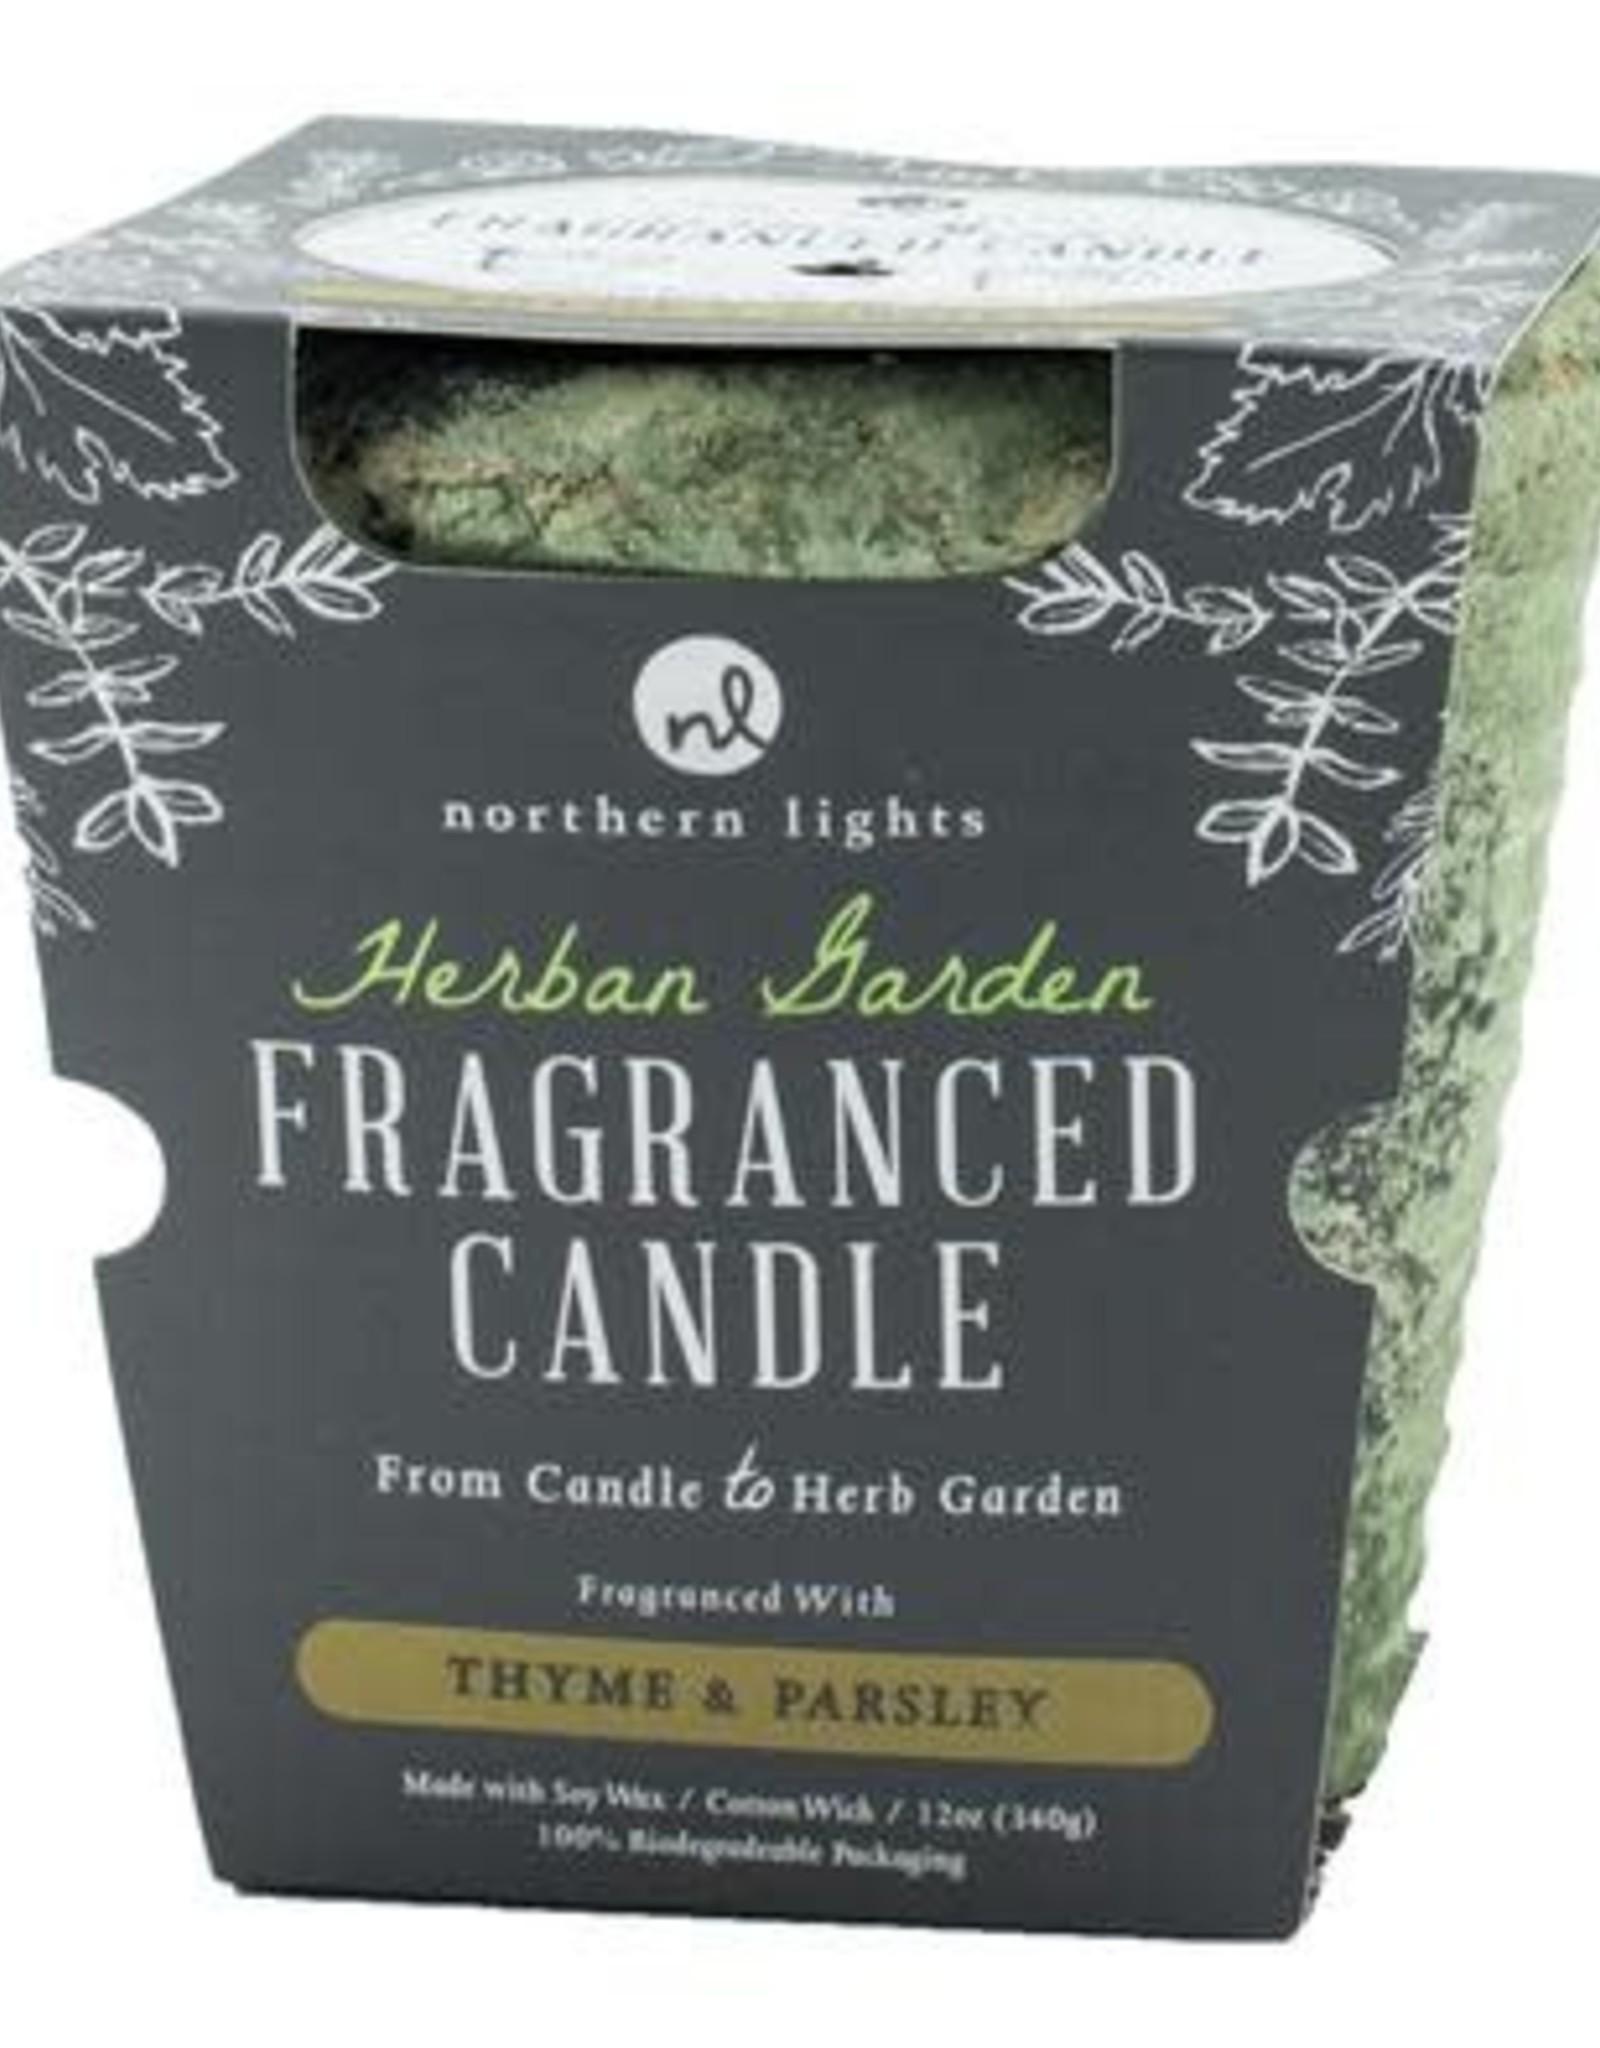 Northern Lights Northern Lights   Herban Garden Candle